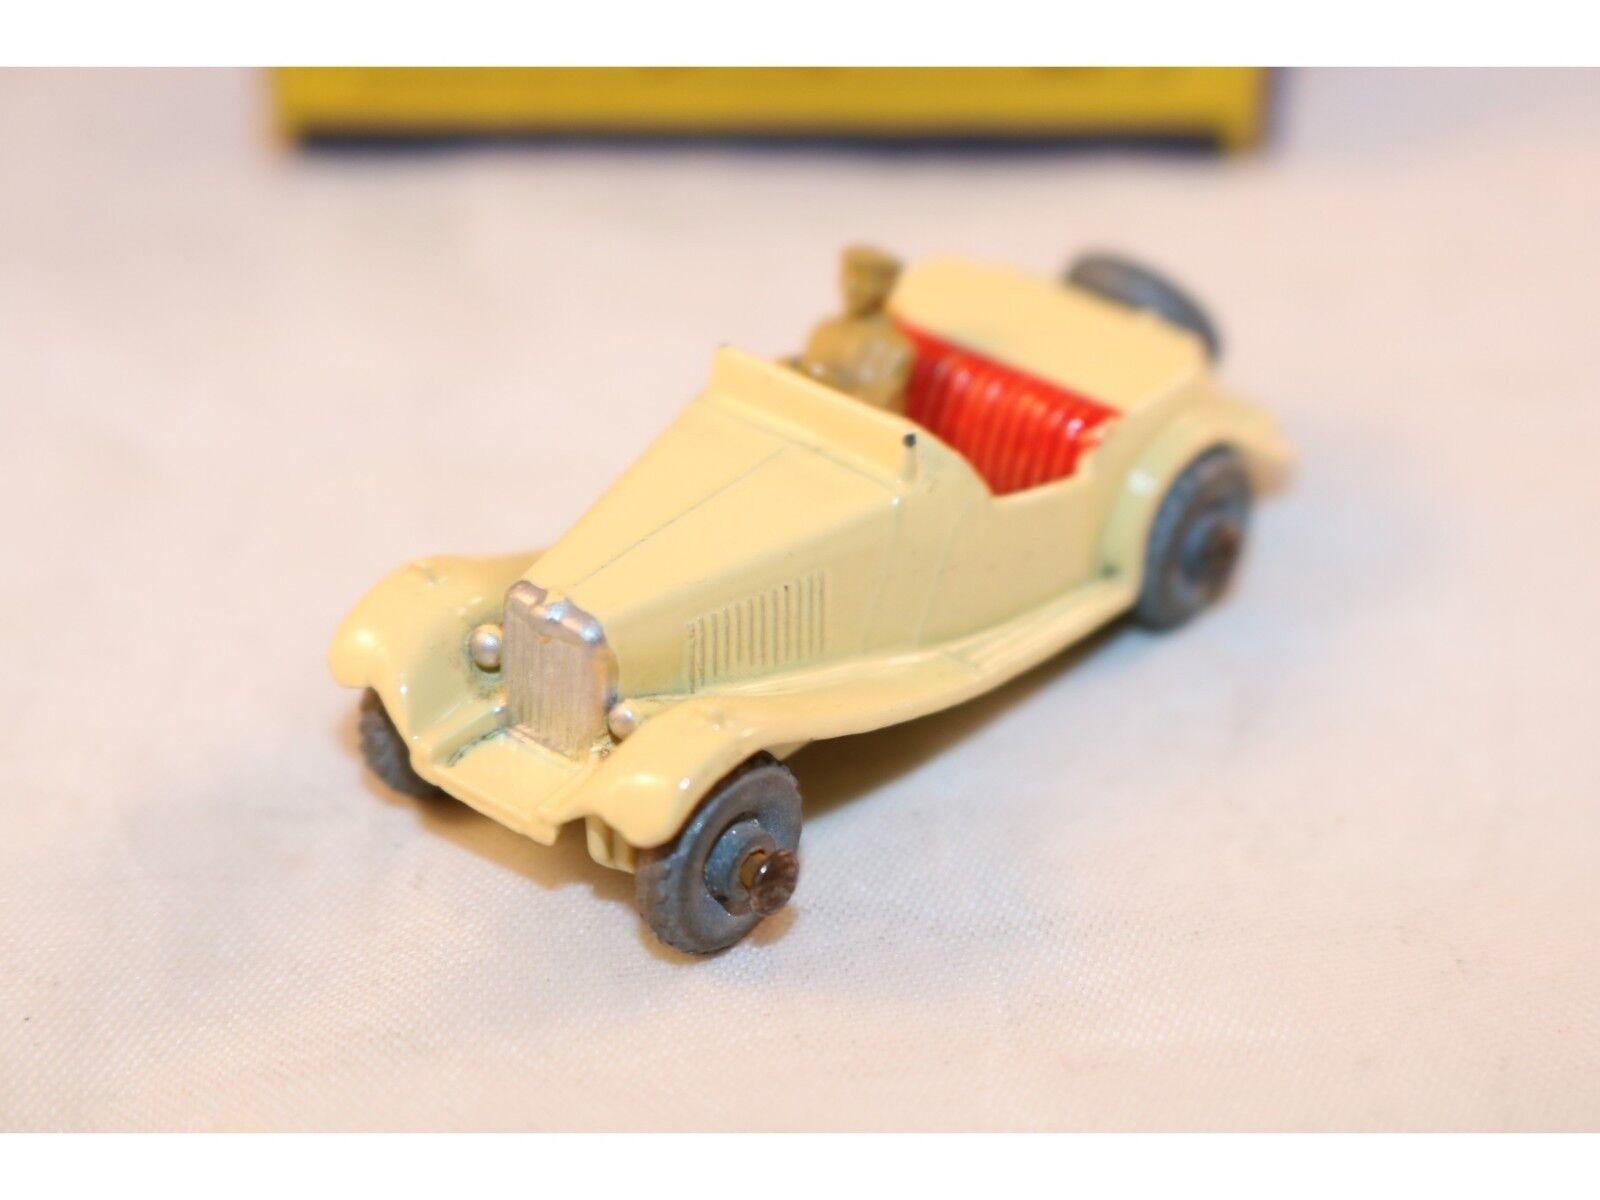 Matchbox A Moko Lesney No 19a 19 M.G. M.G. M.G. Sports car GMW yellow 99% mint in box 364b2e